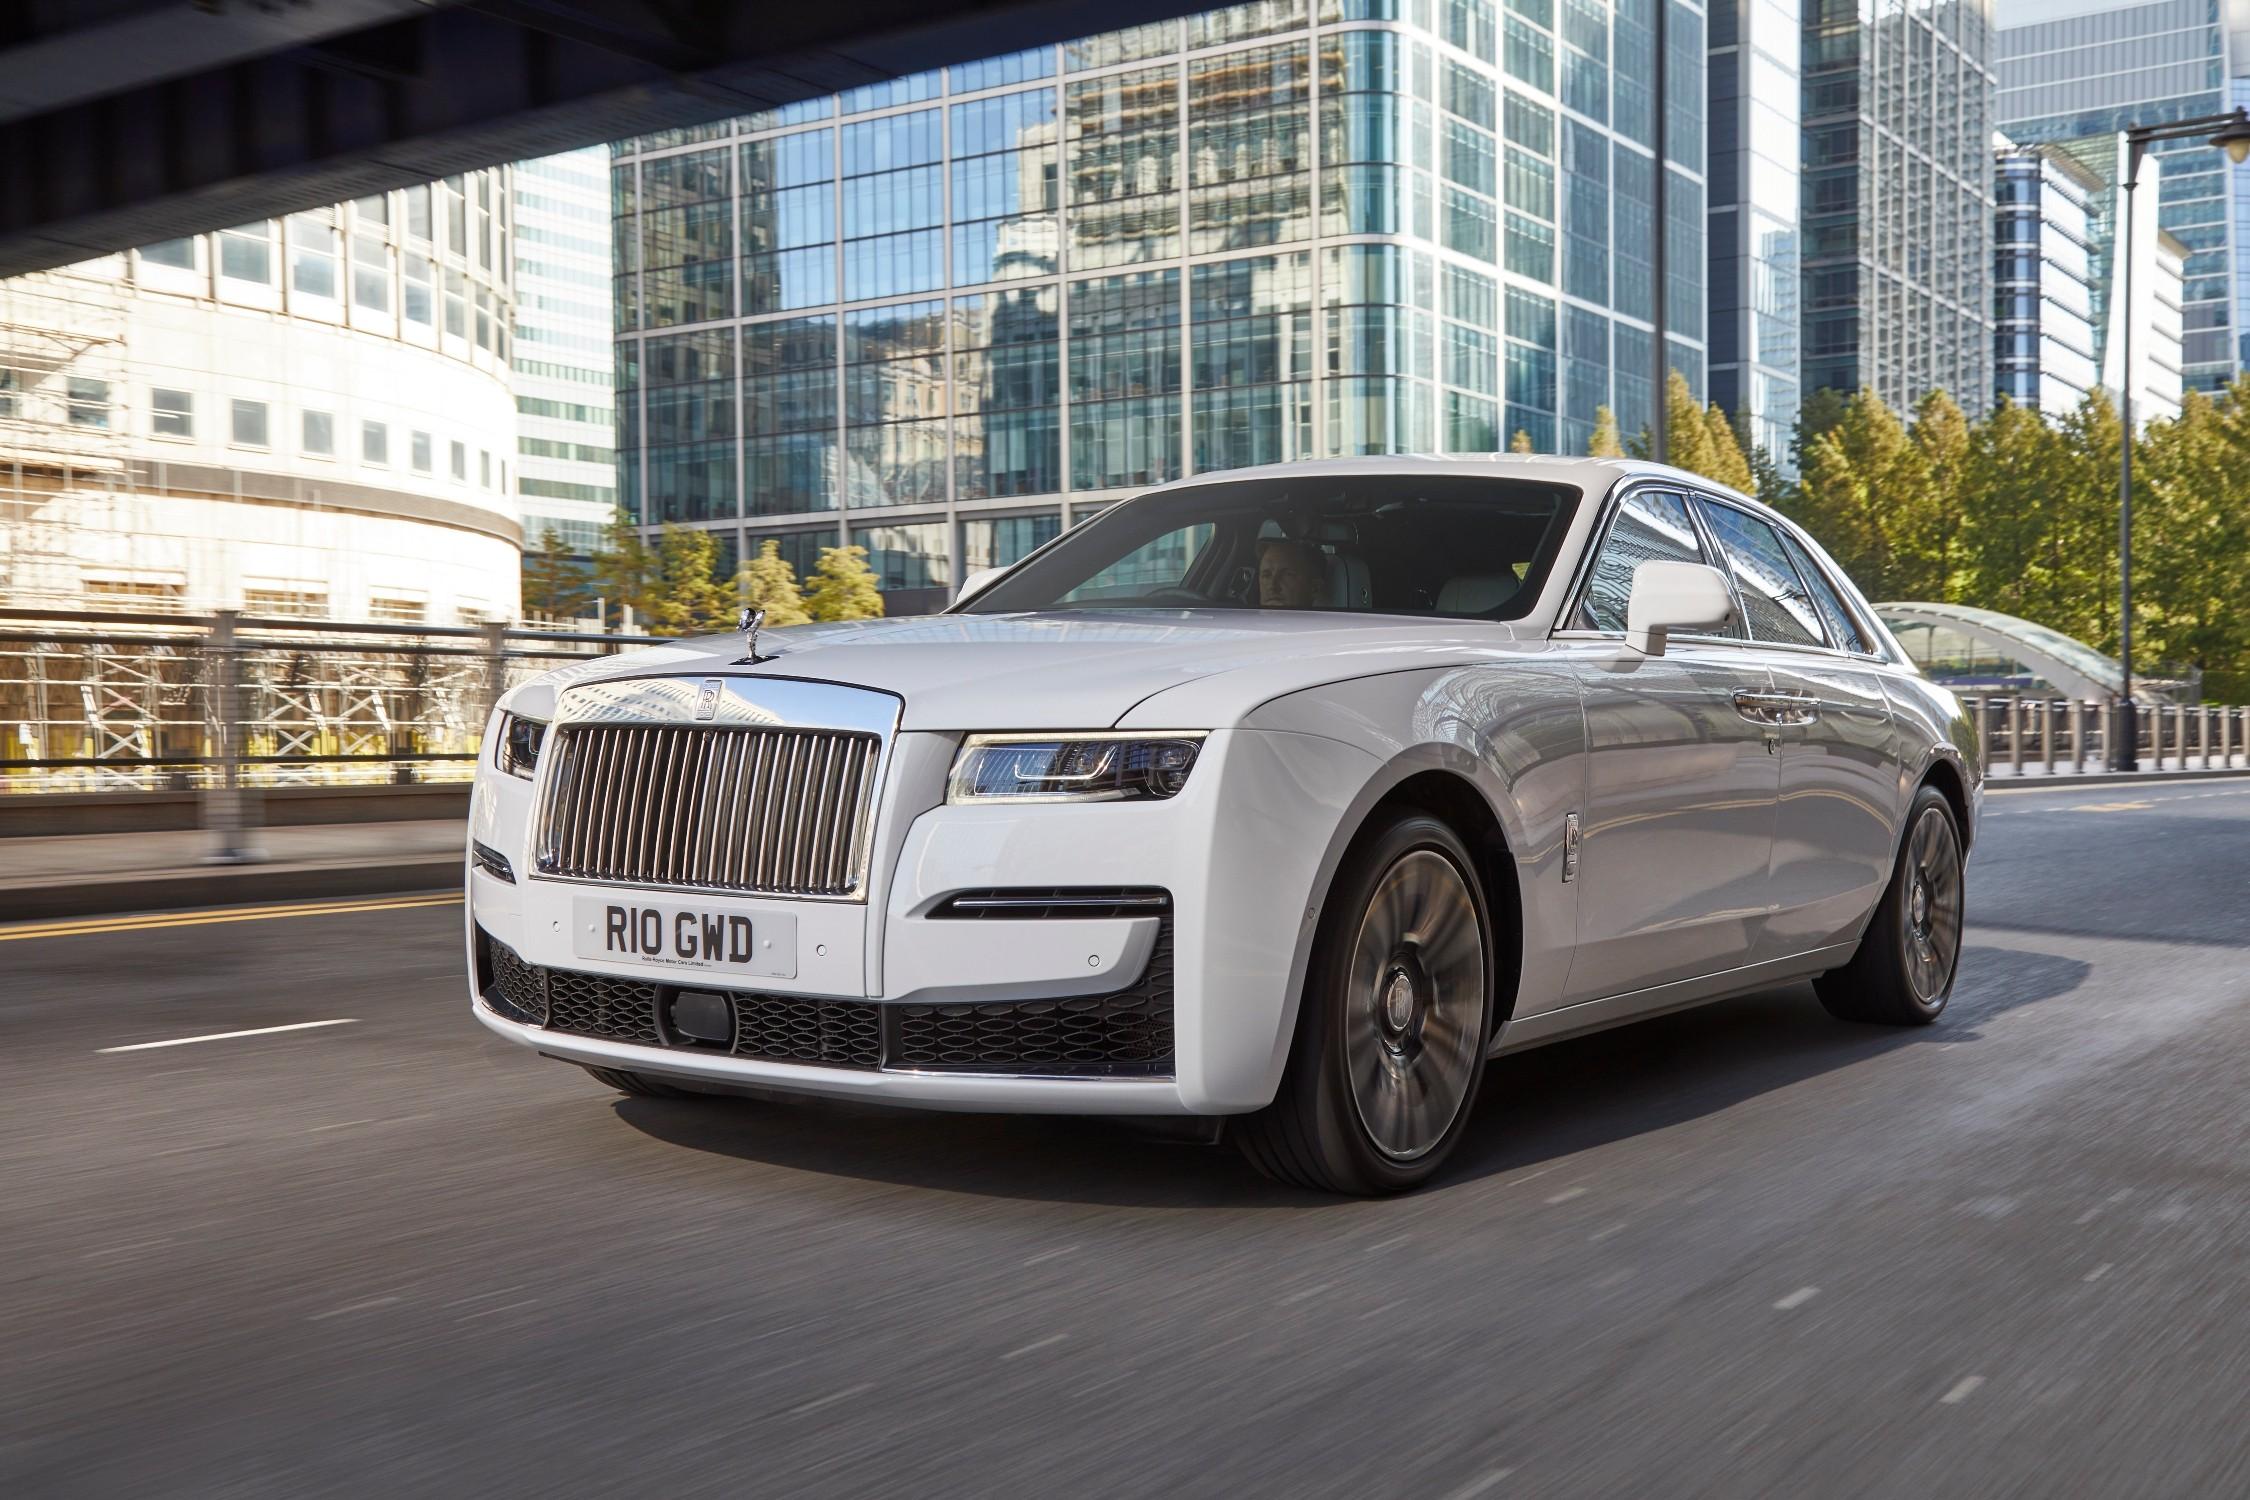 Price of Rolls Royce Ghost in Nigeria